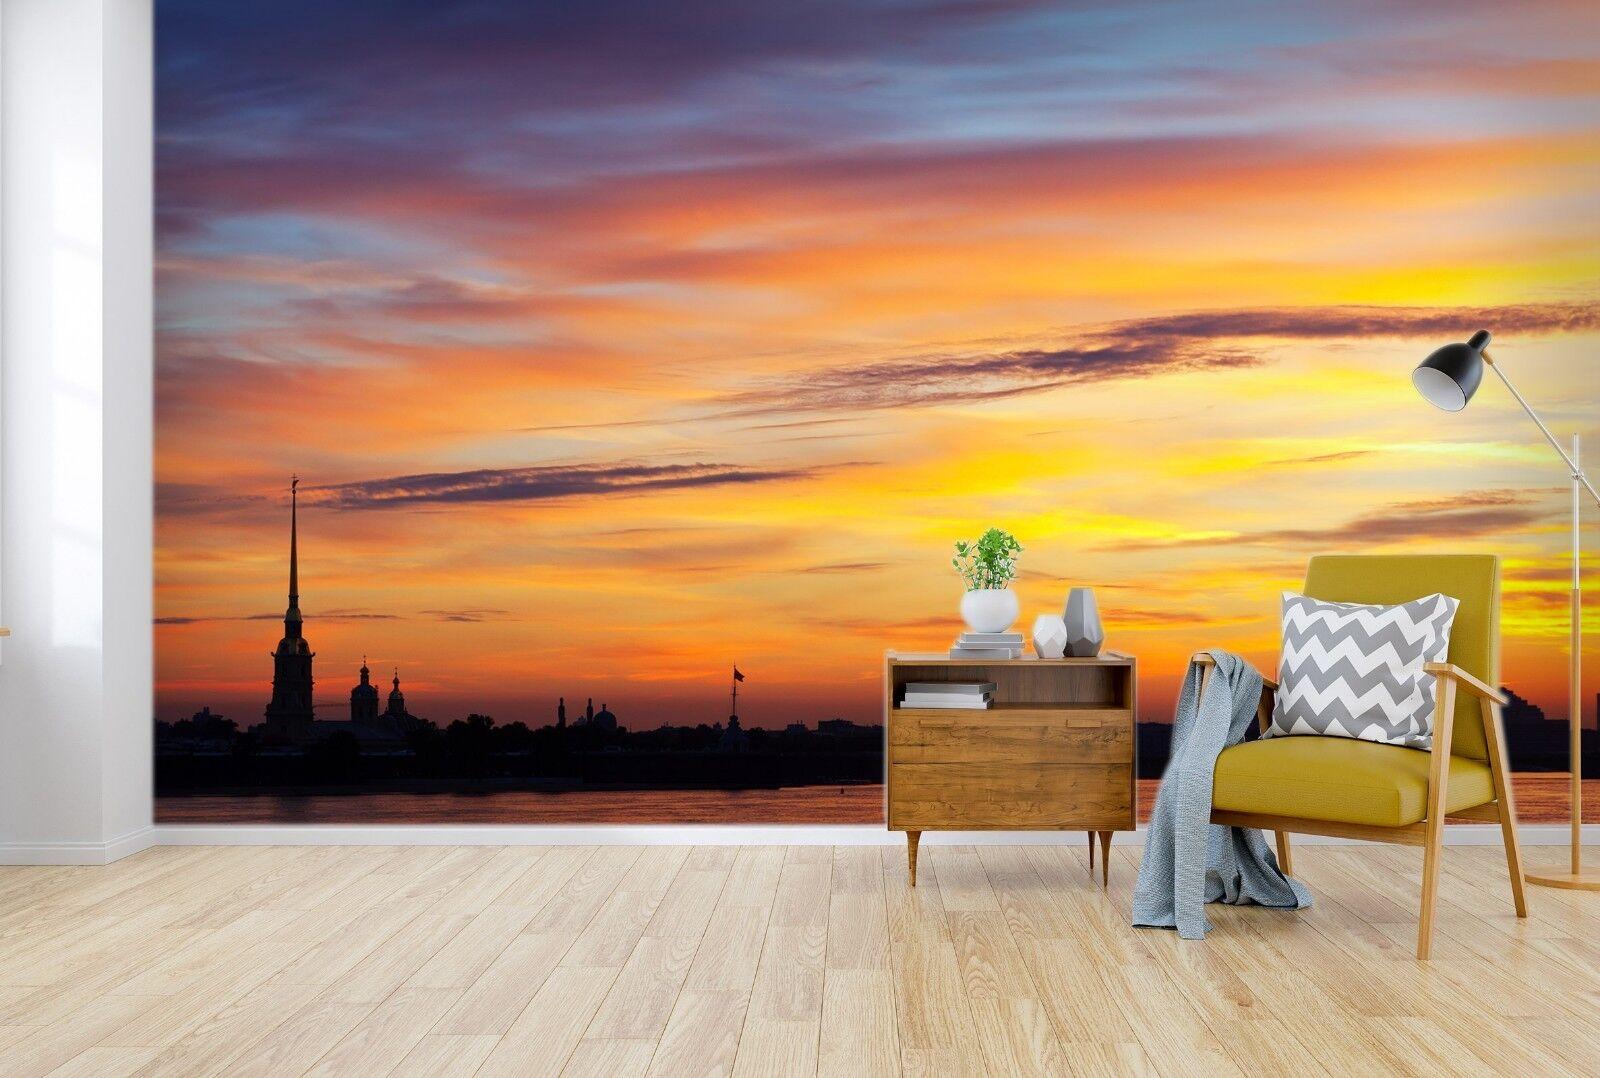 3D Sunset Clouds Sky 562 Wallpaper Murals Wall Print Wallpaper Mural AJ WALL UK